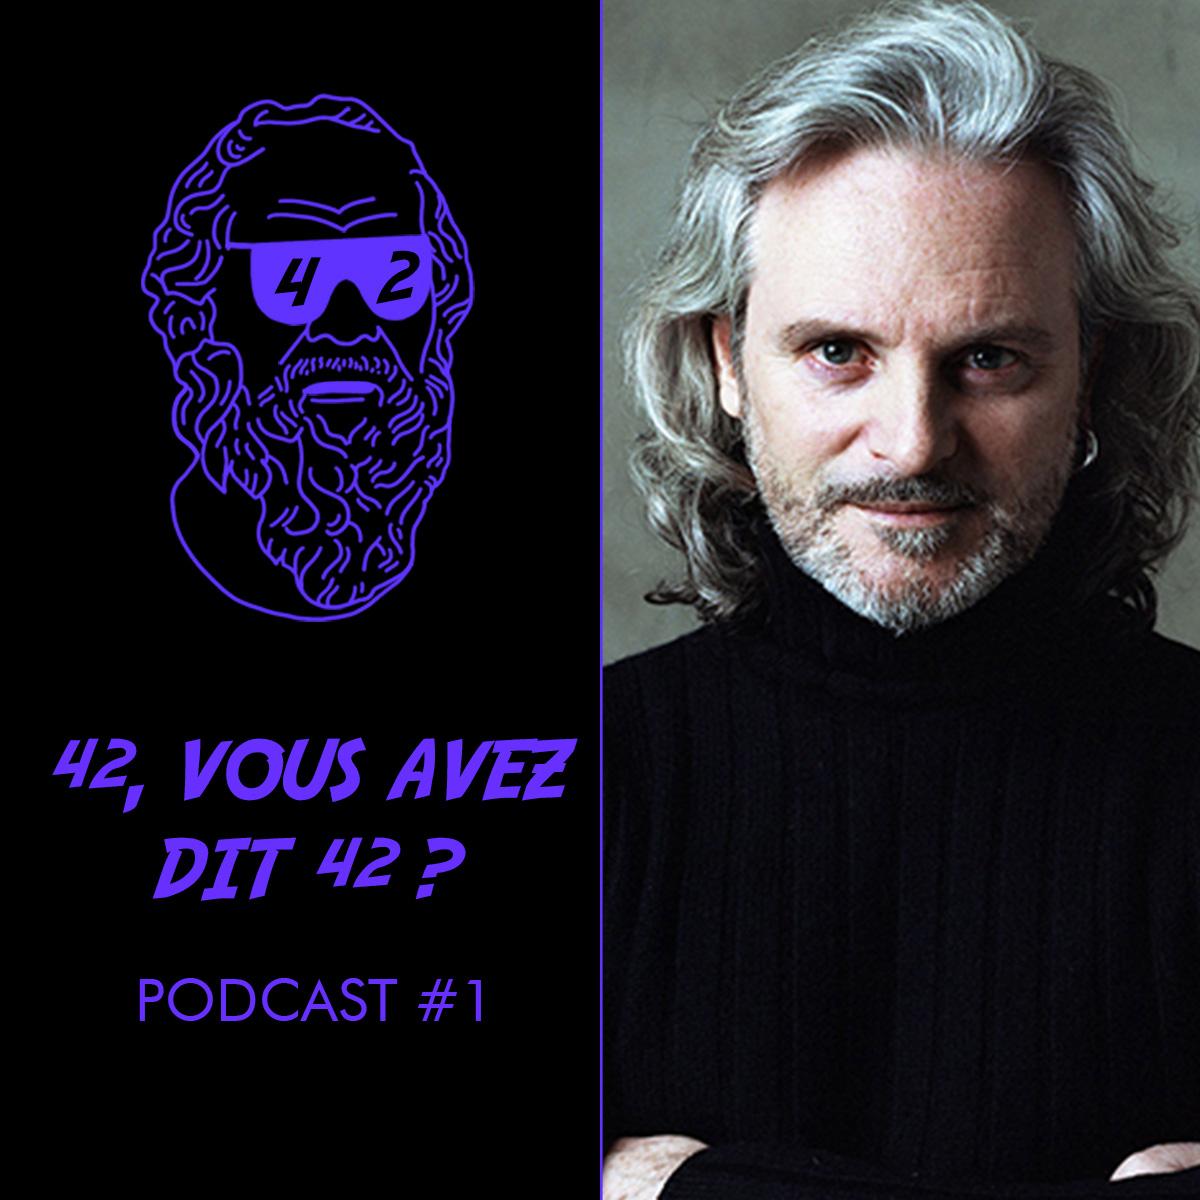 podcast 1, 42, PADG